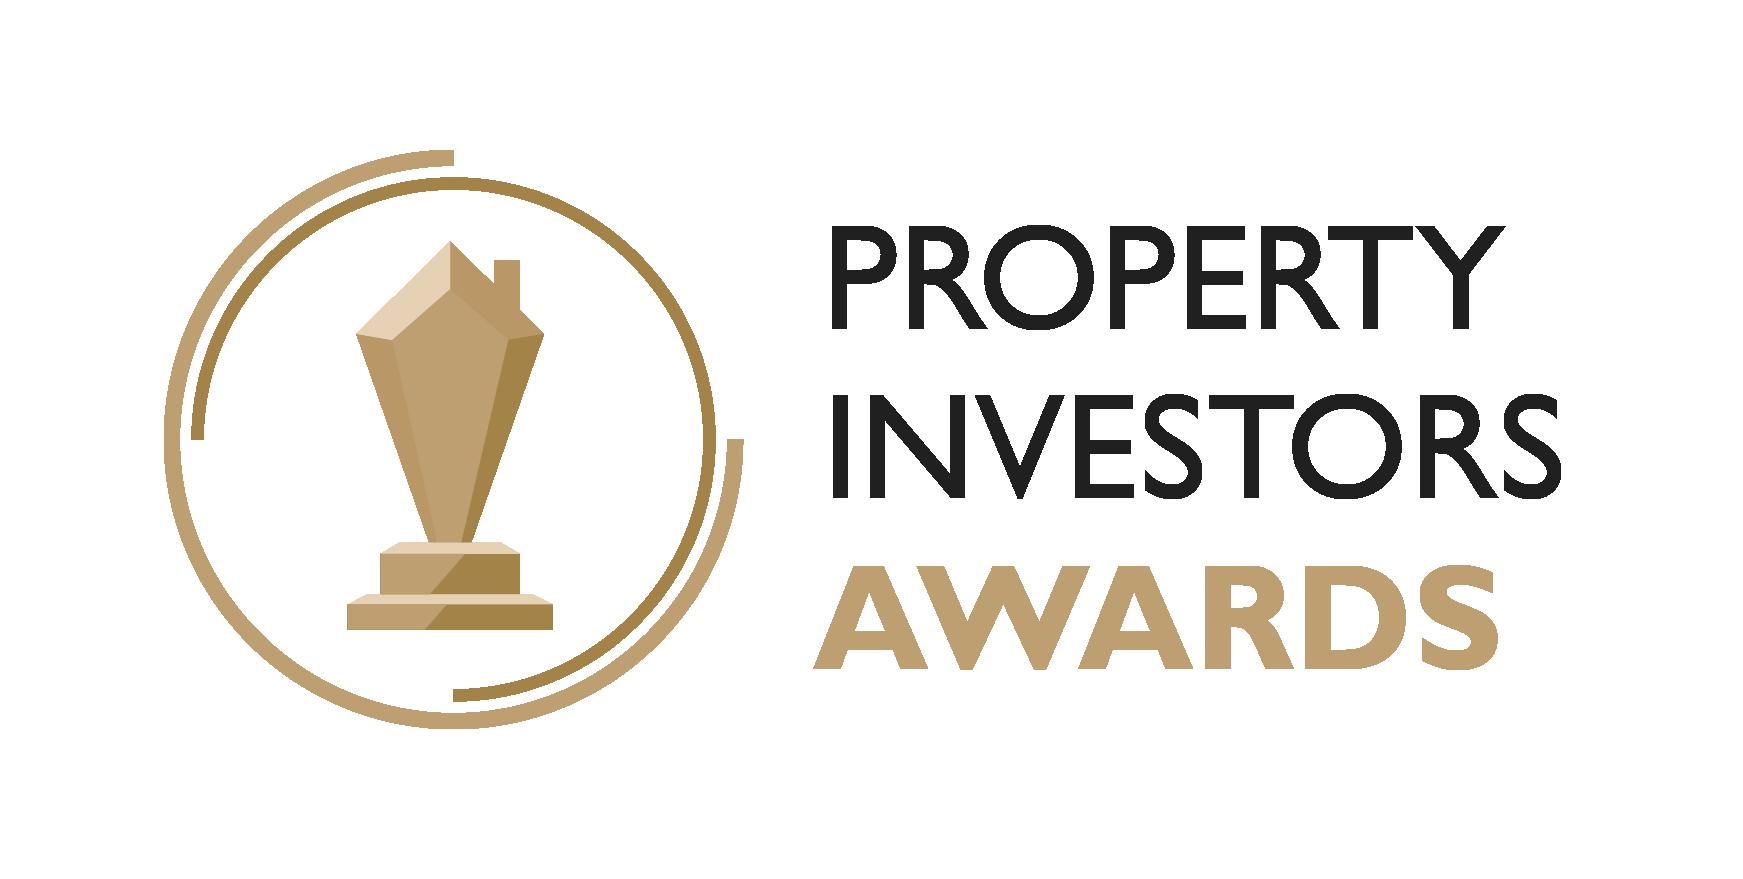 Property Investors Award